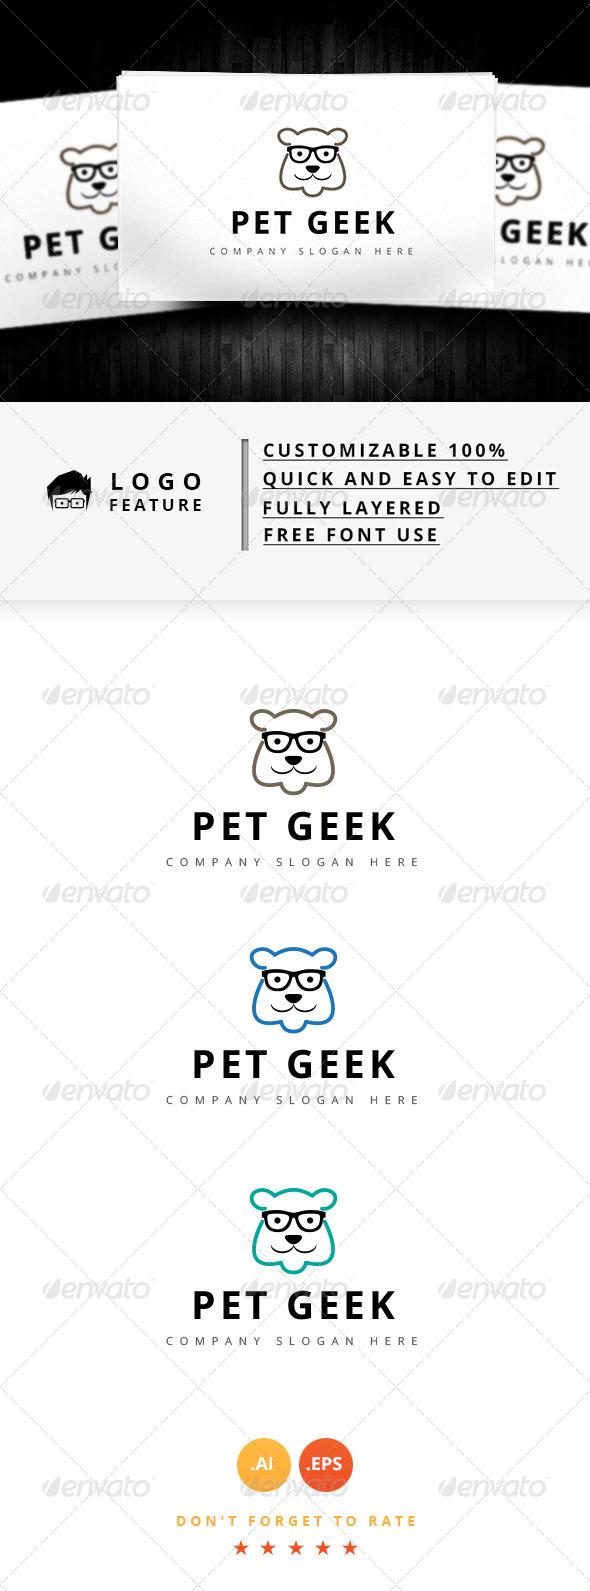 GraphicRiver Pet Geek Logo 8645334